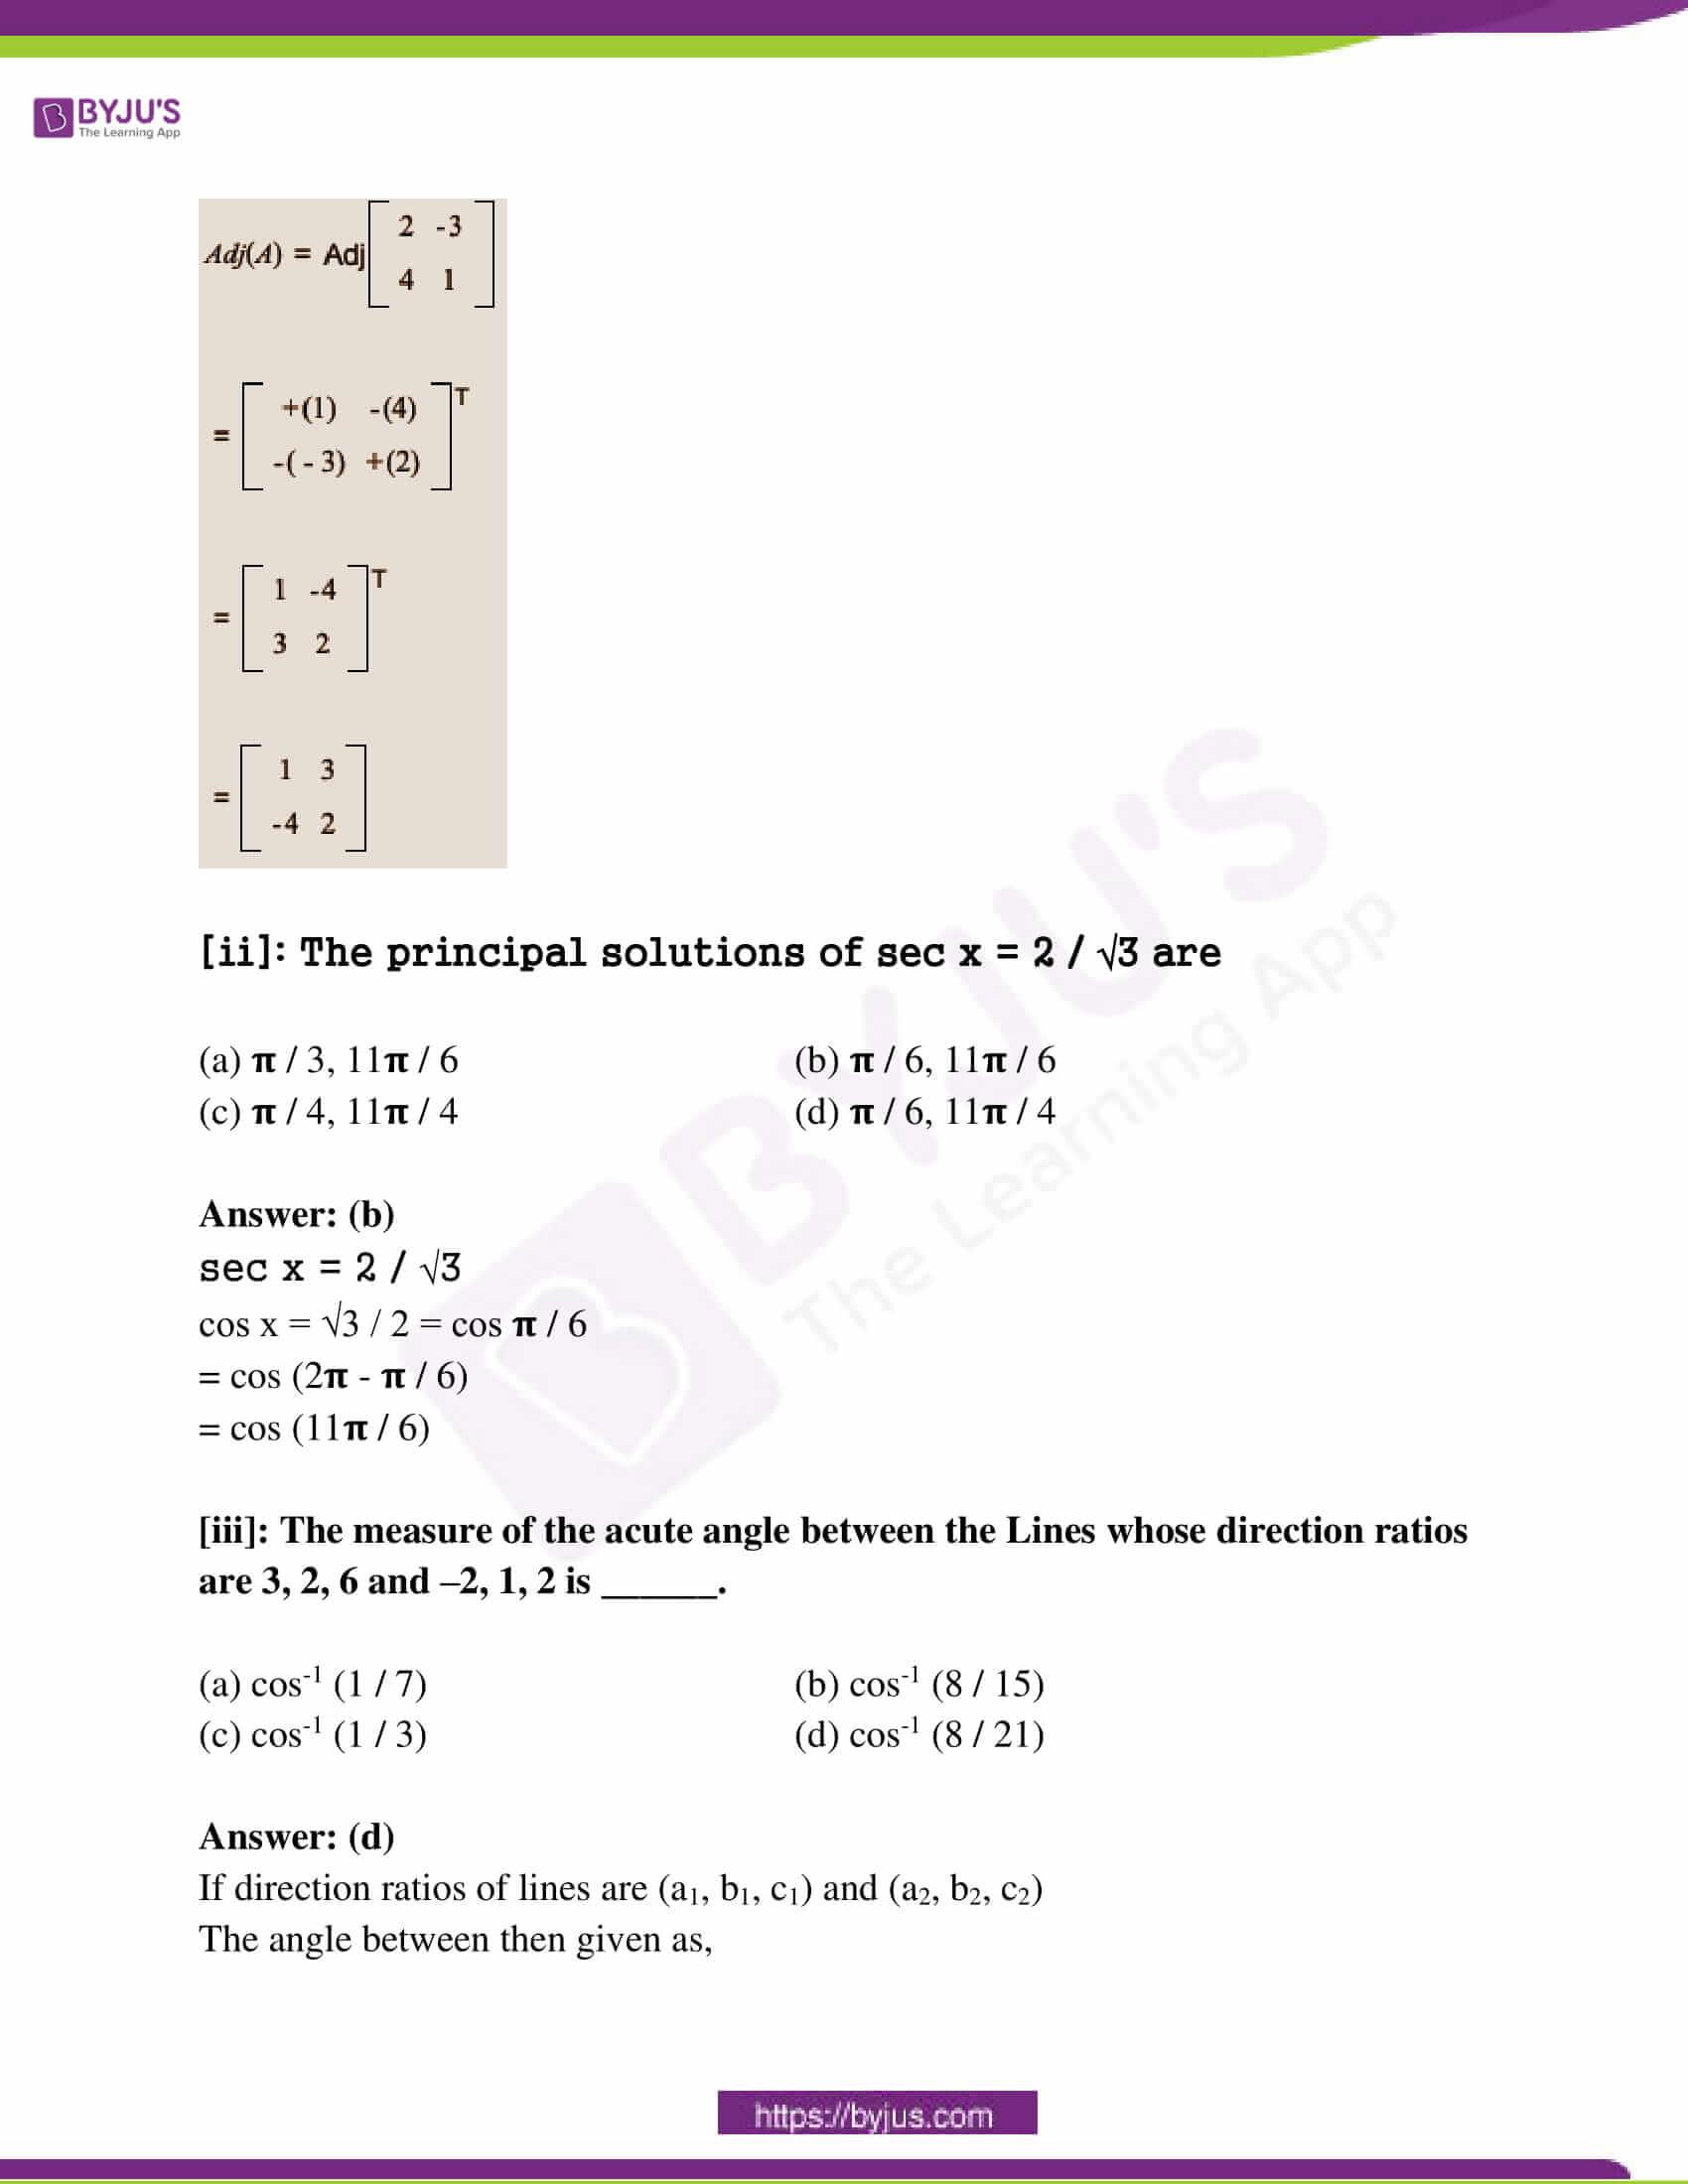 maharashtra class 12 exam question paper solutions march 2018 02